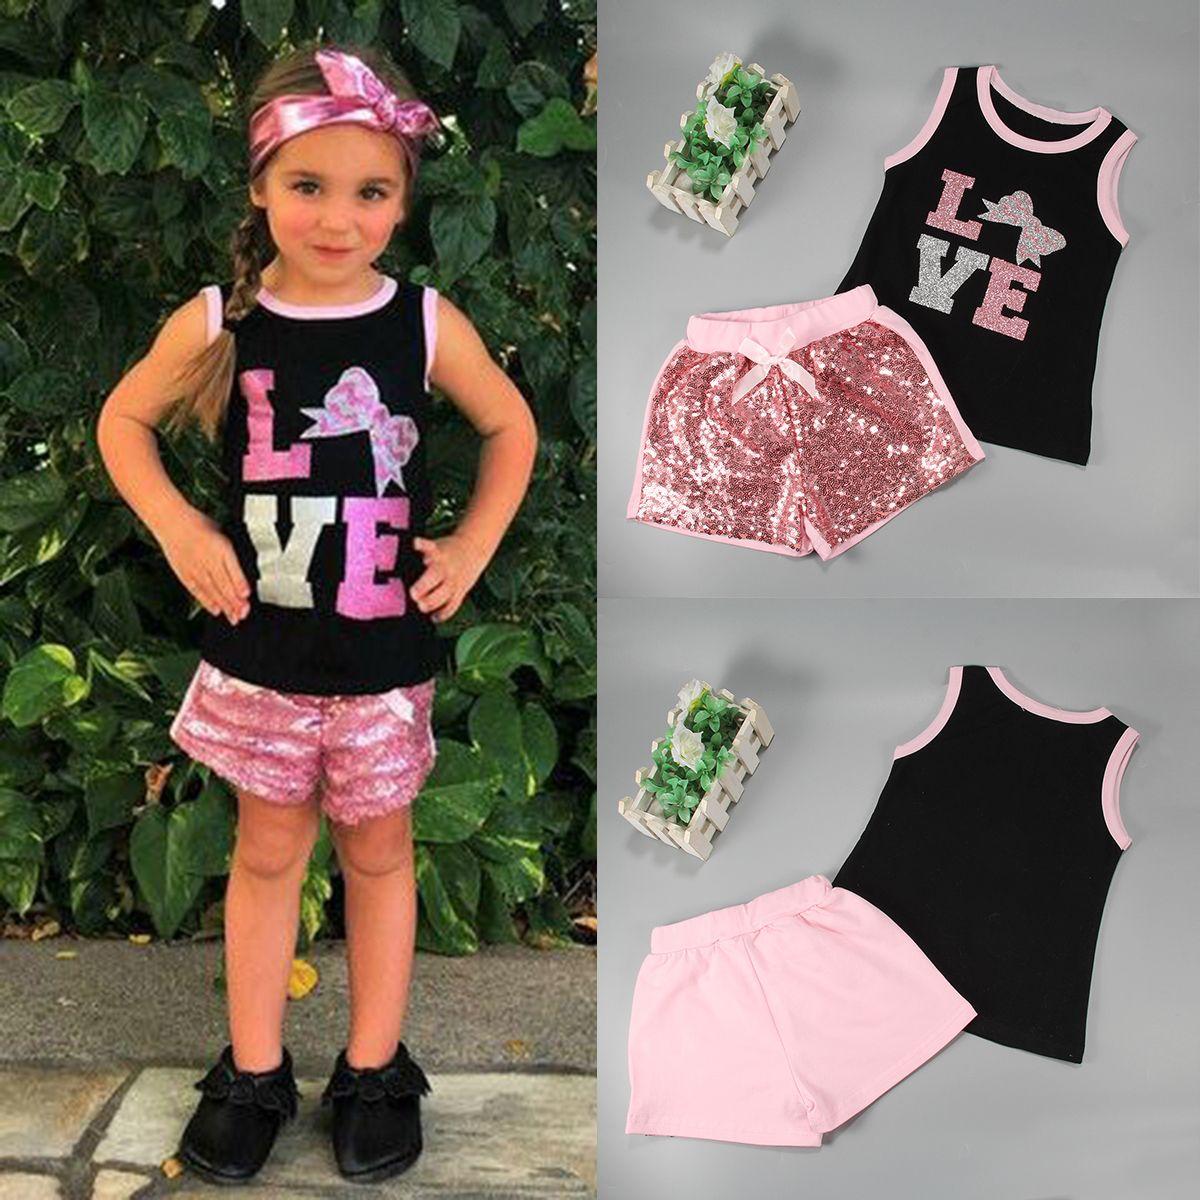 60cef34c3 2pcs Toddler Kids Baby Girls Summer Clothes T-shirt Tops+Shorts ...